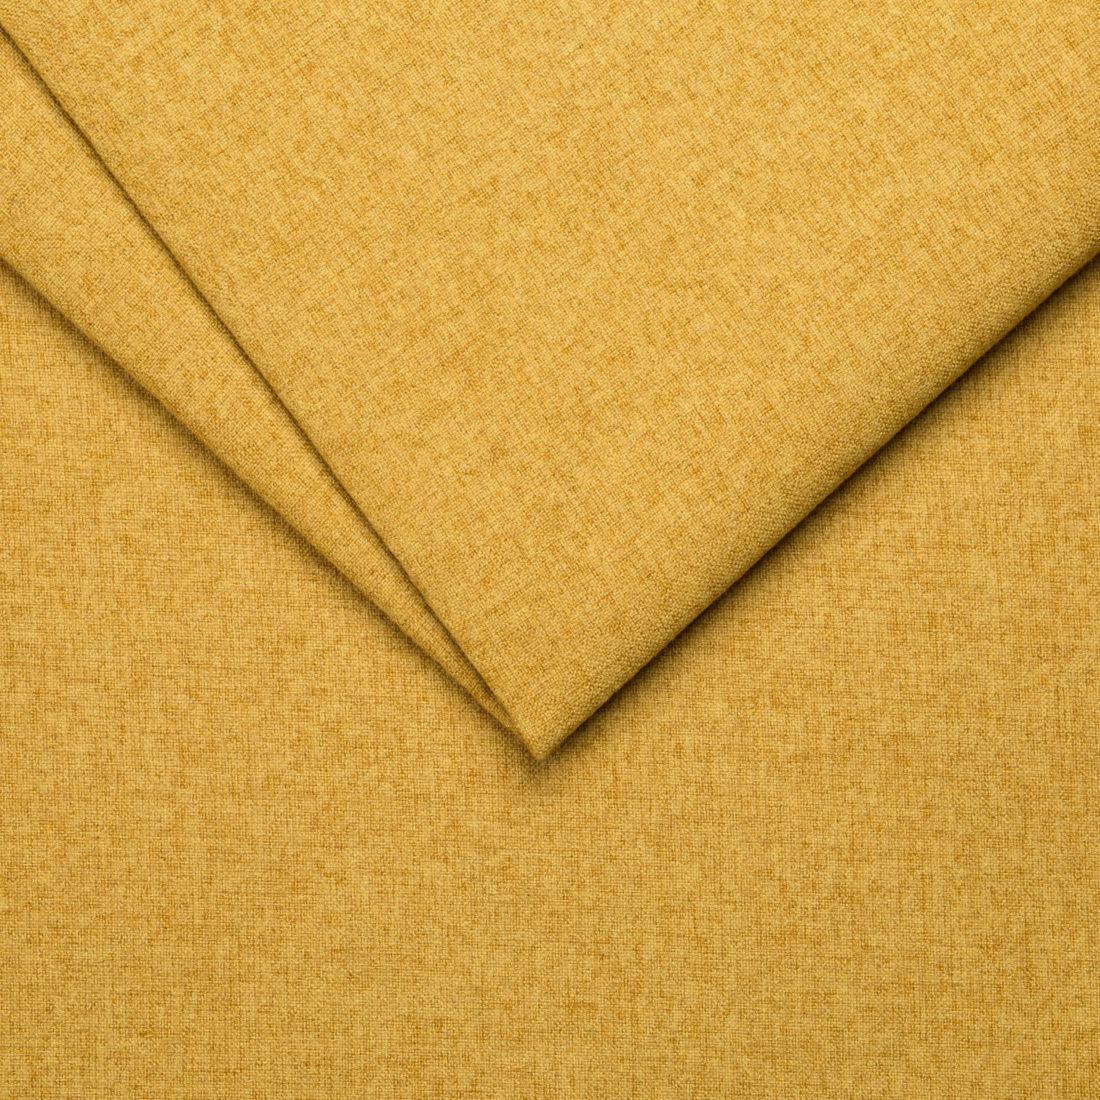 Меблева тканина Cashmere 14 Mustard, рогожка